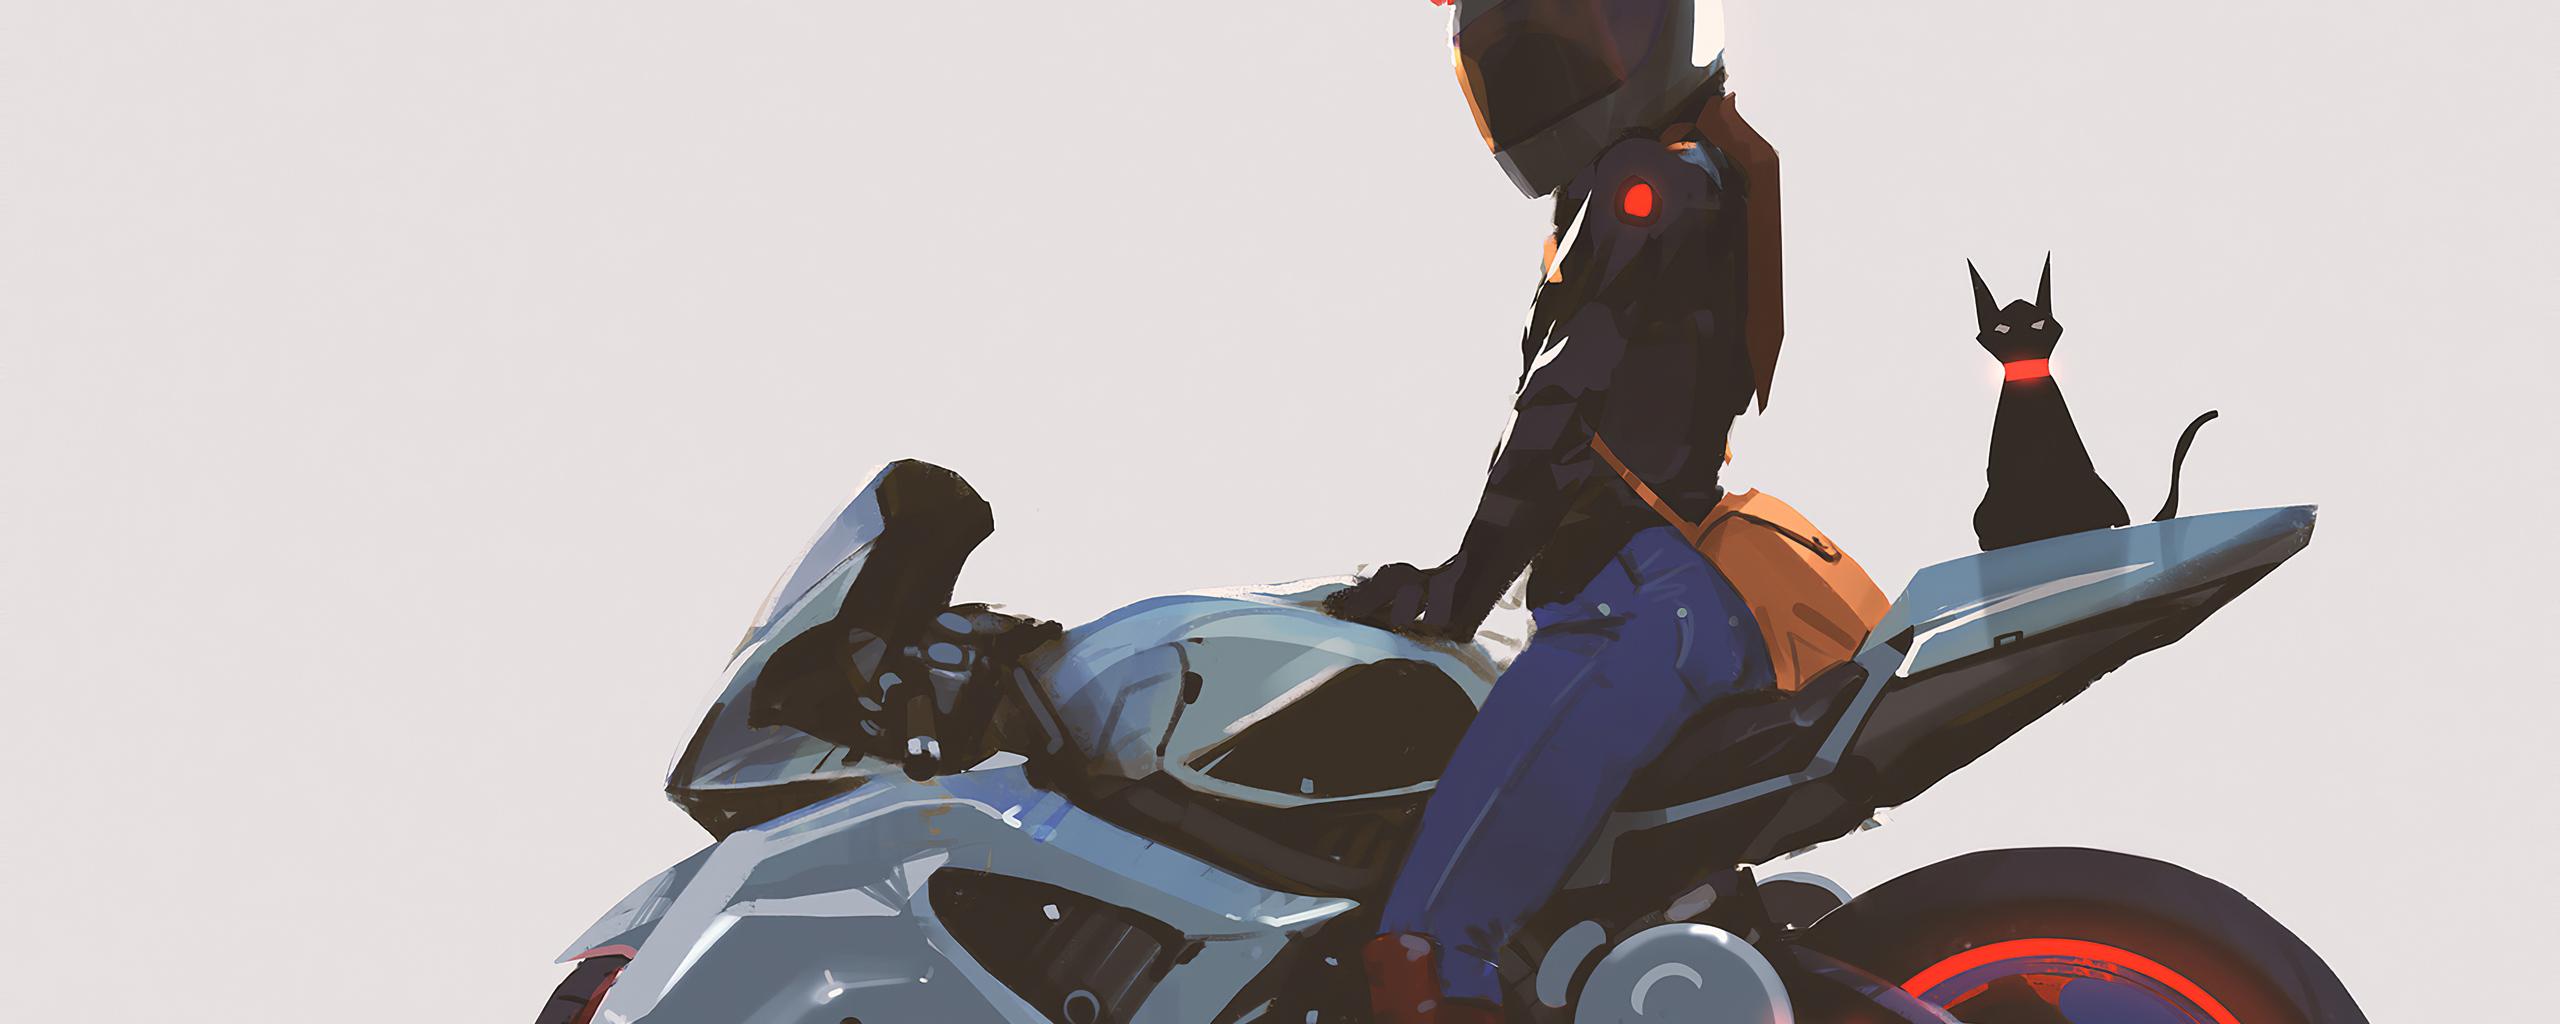 biker-girl-with-cat-behind-4k-7w.jpg